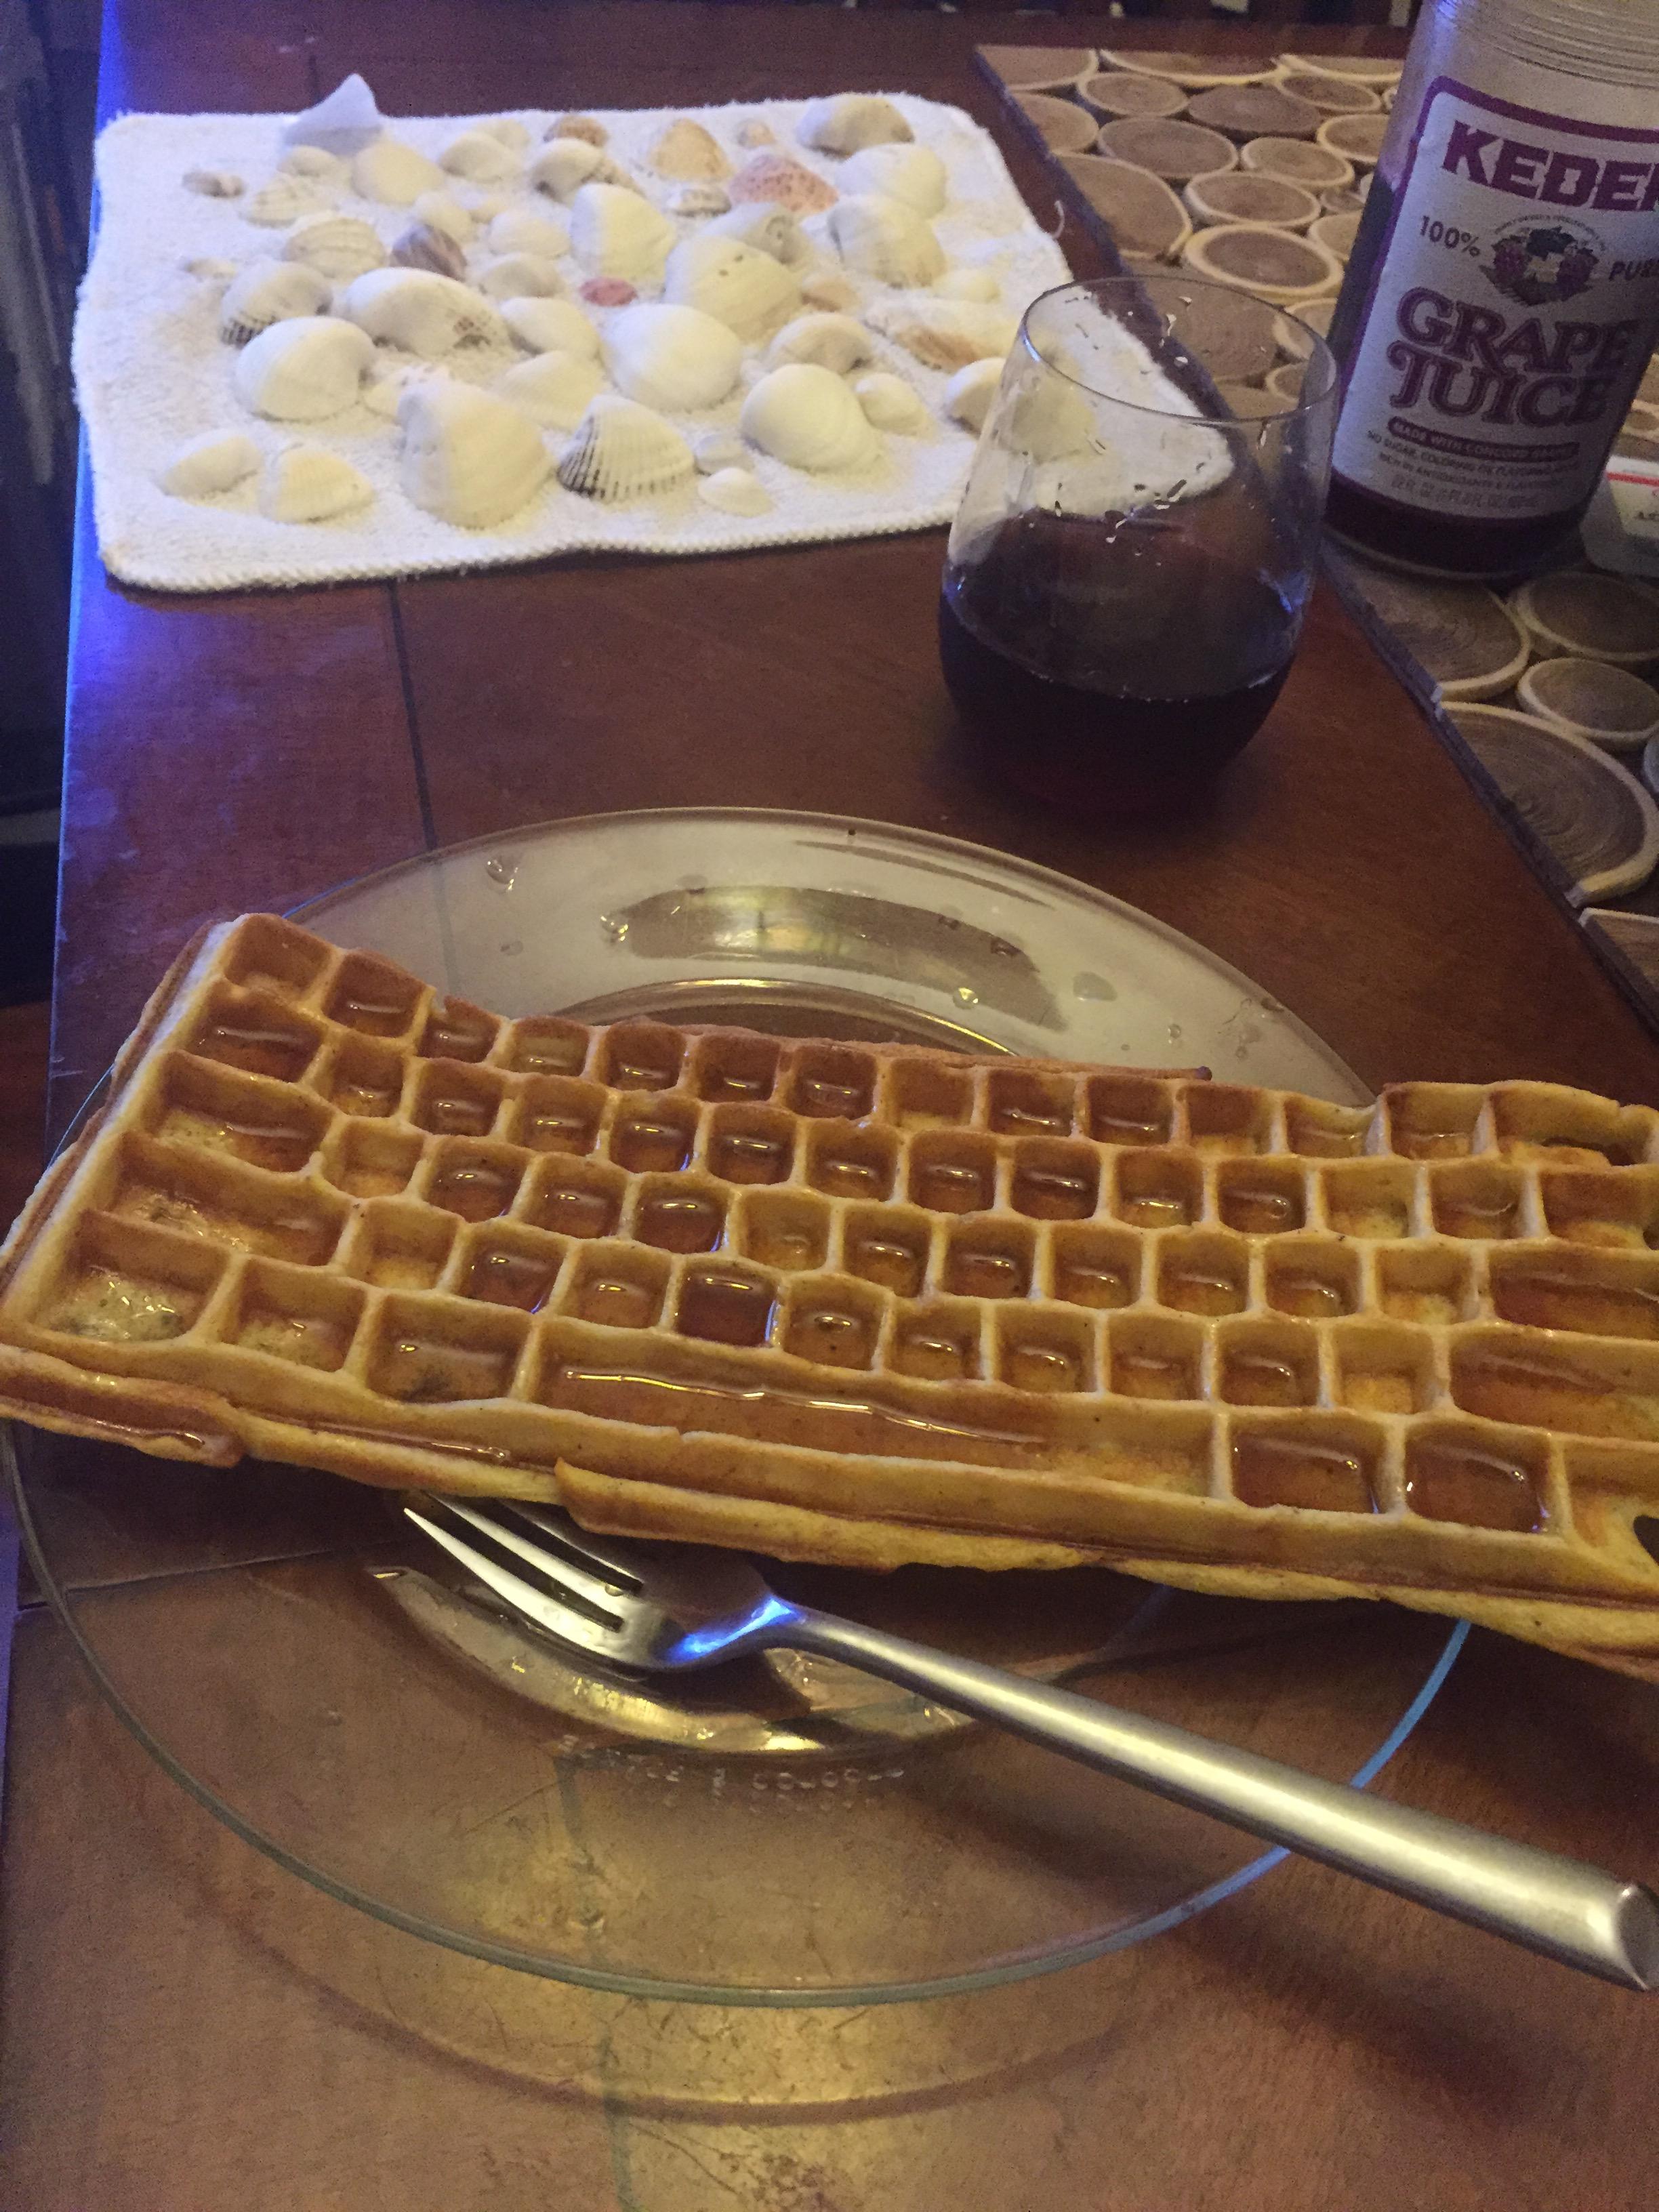 Yum! Keyboard-shaped Waffle | UncommonGoods